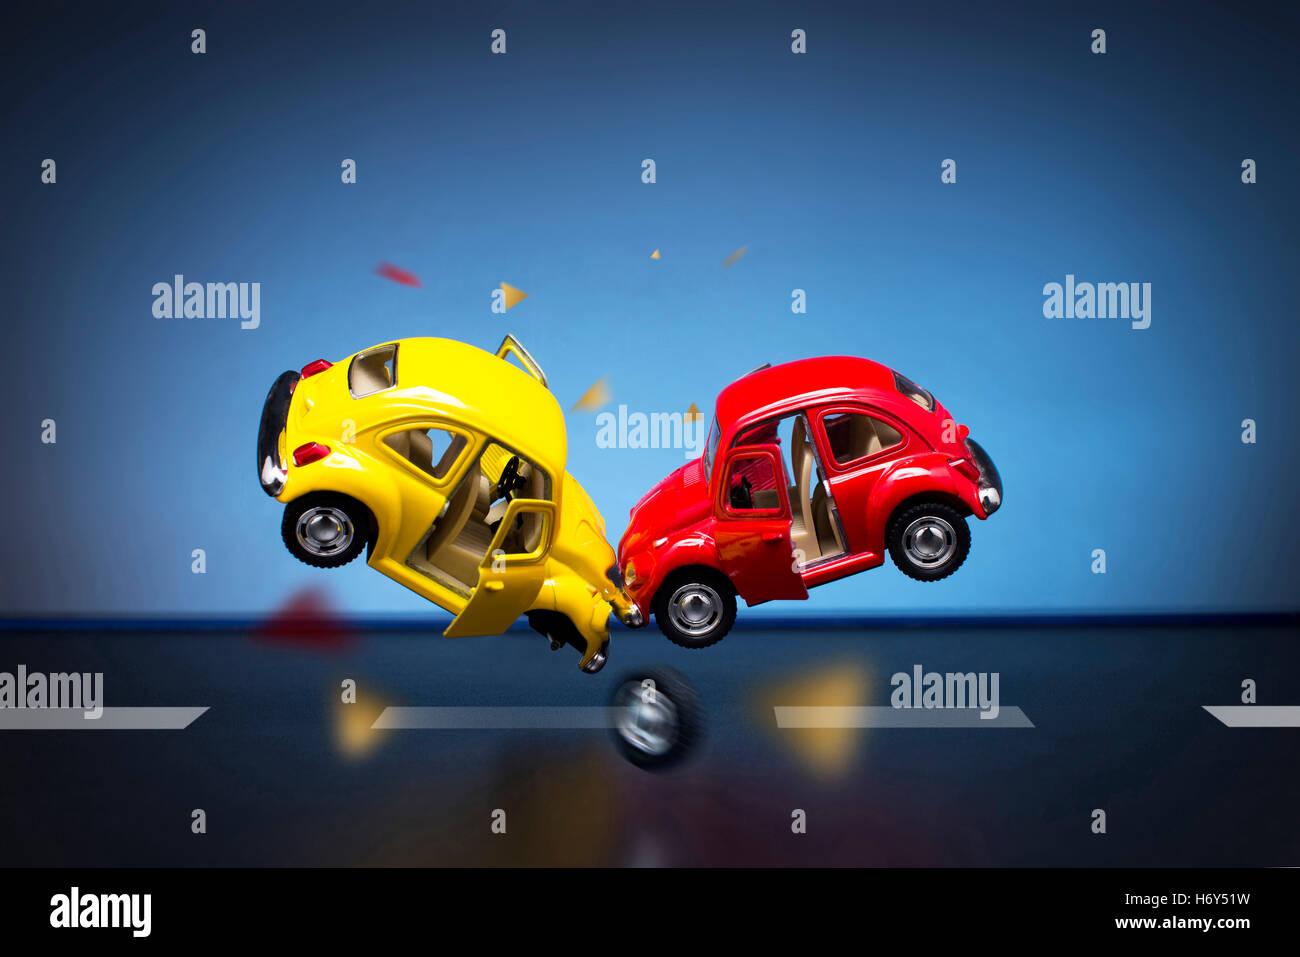 Asphalth Stockfotos & Asphalth Bilder - Alamy